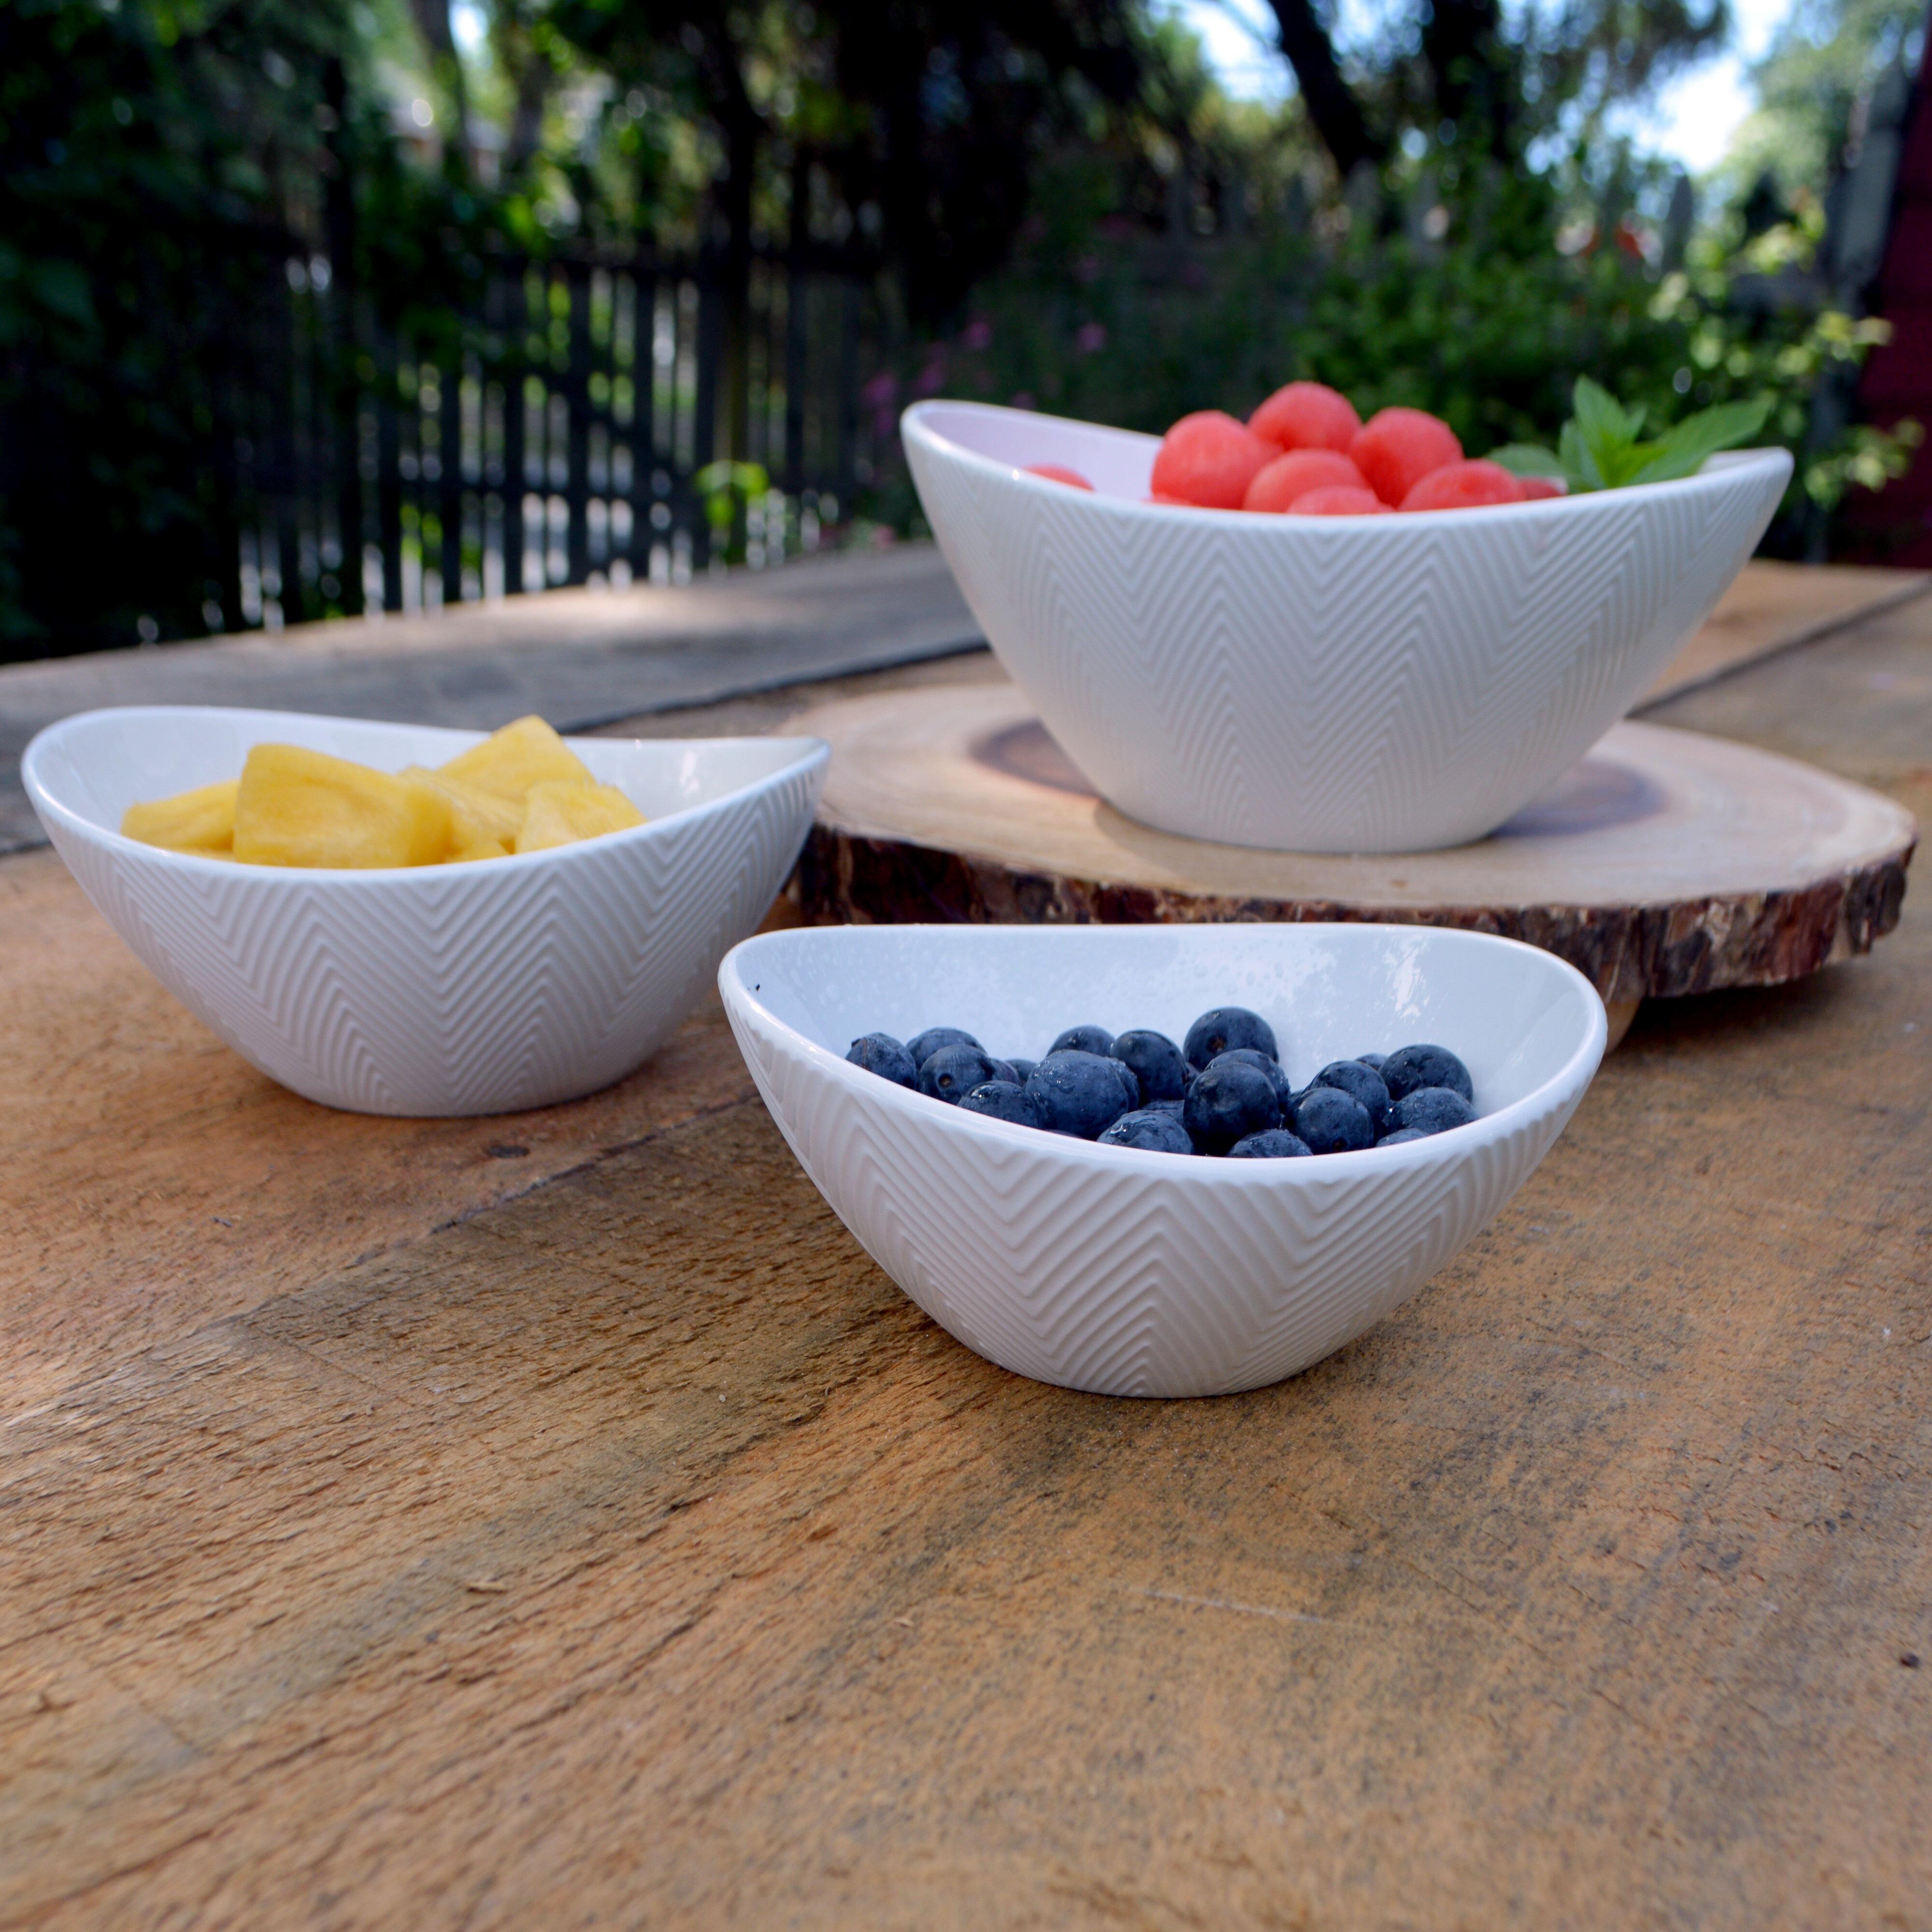 Microwave Safe Set Of 3 Serving Bowls You Ll Love In 2021 Wayfair